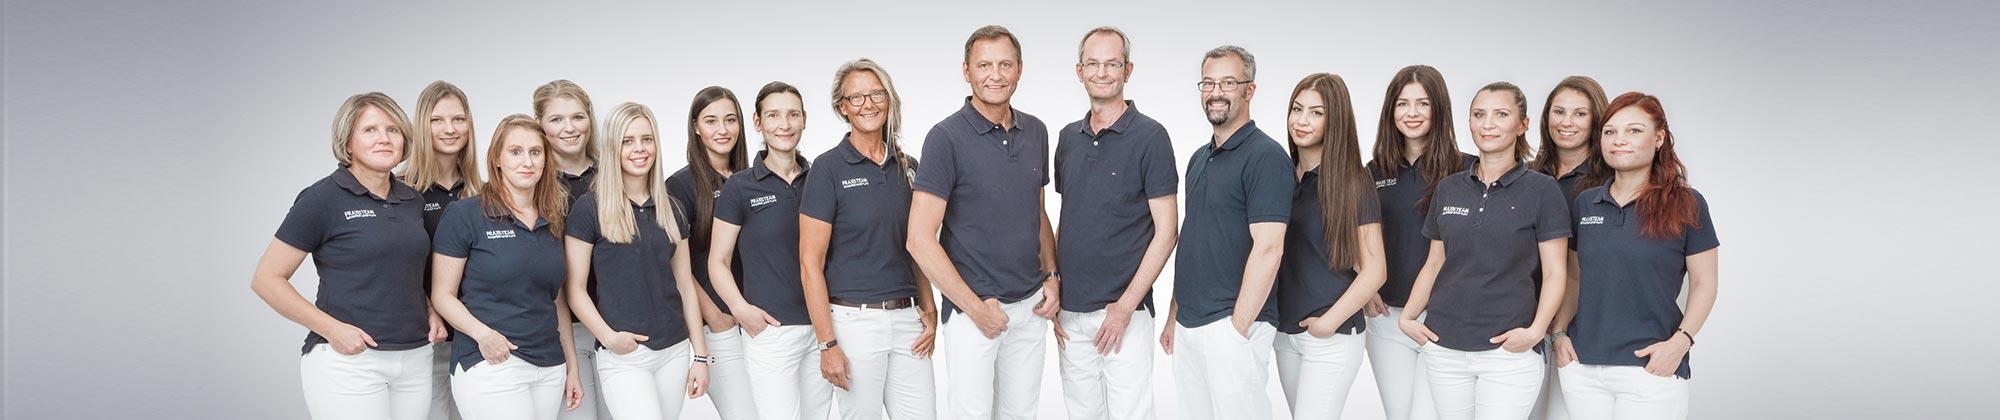 Teambild Orthopädie Zentrum Hannover